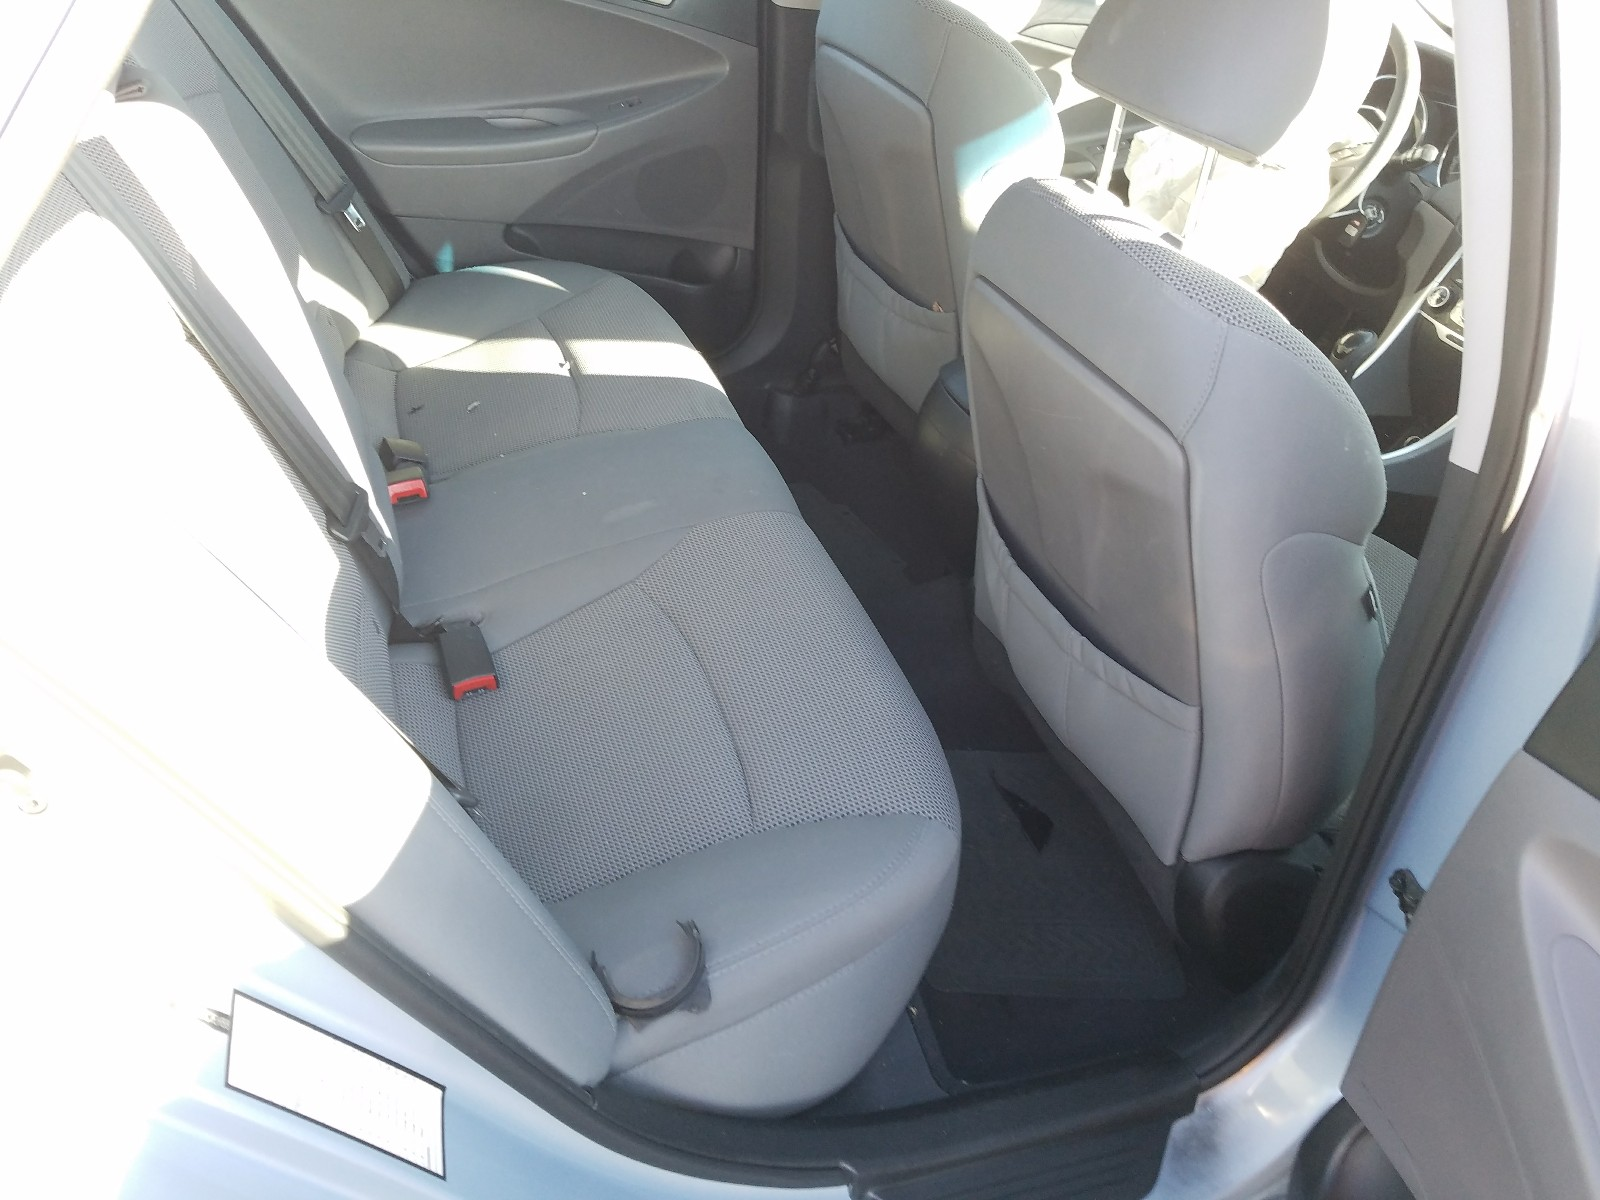 5NPEB4AC7EH889924 - 2014 Hyundai Sonata Gls 2.4L detail view